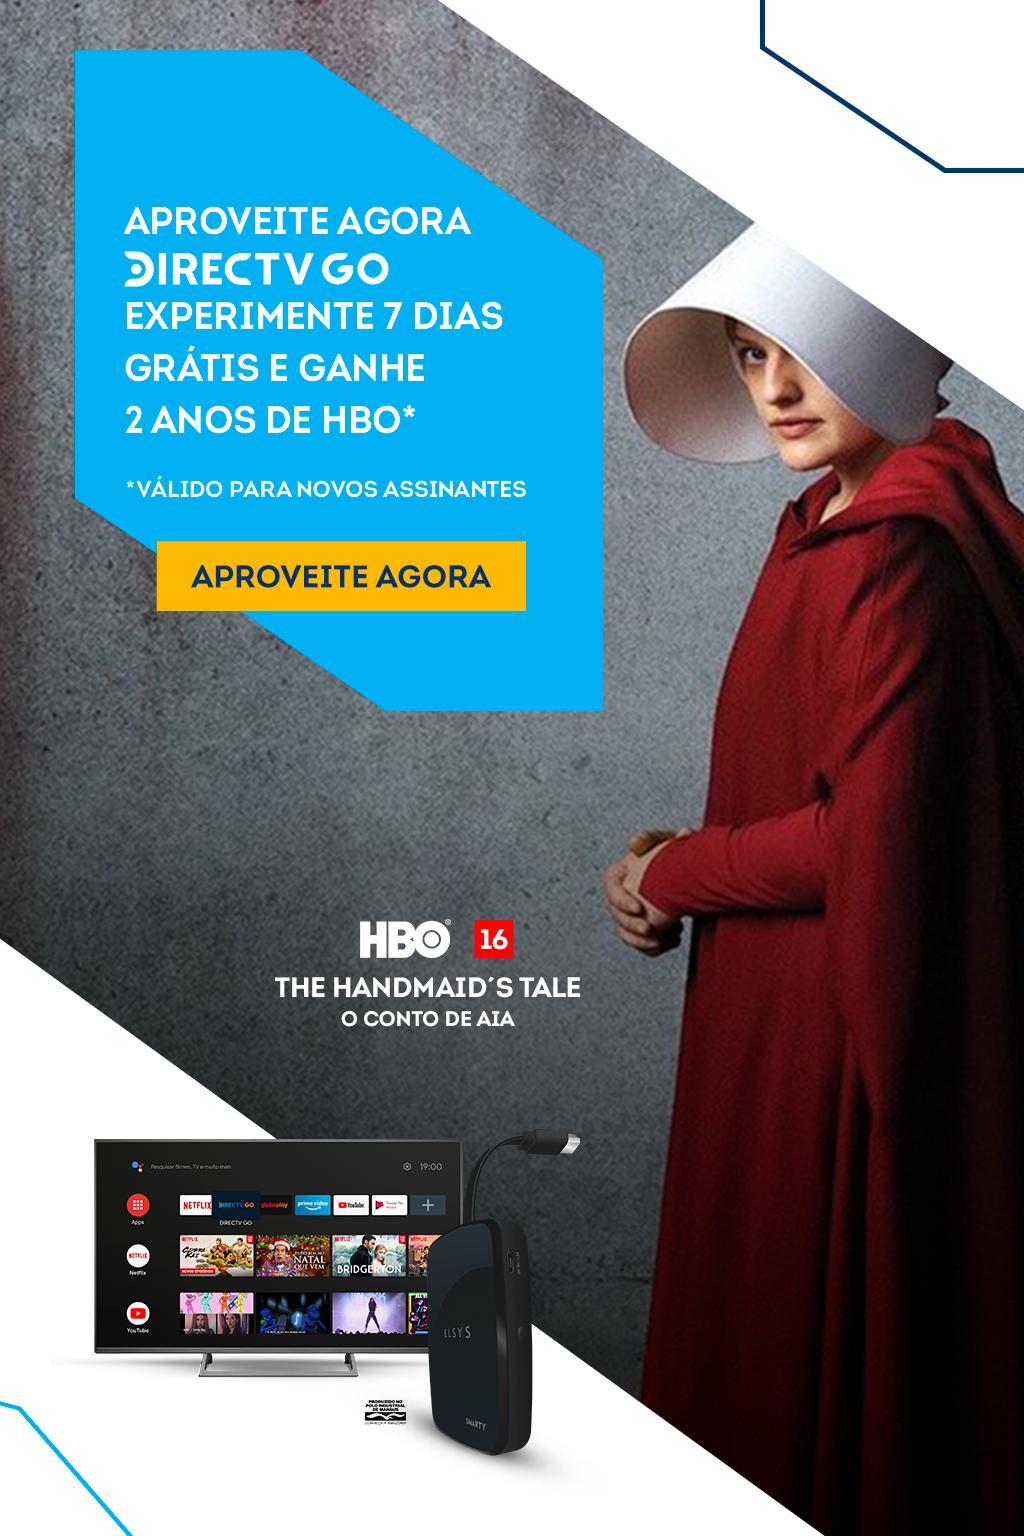 DTVGO+HBO